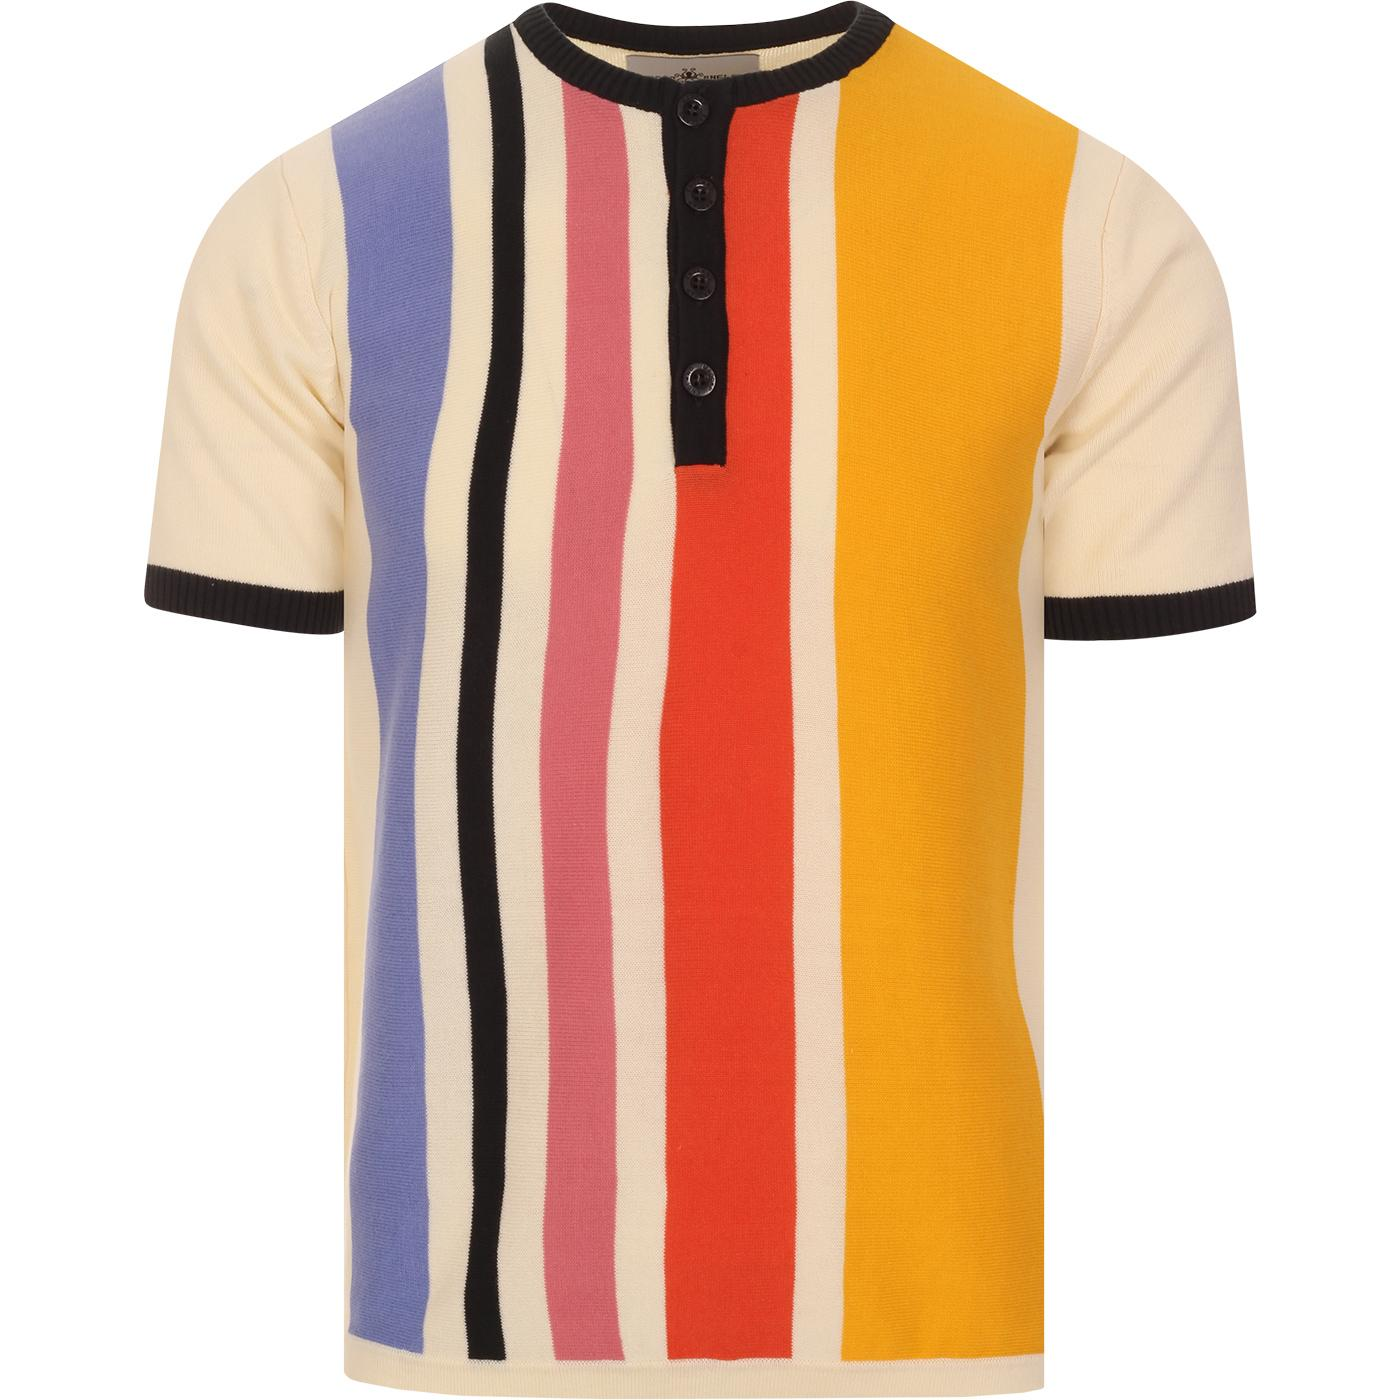 madcap england mens grandad collar vertical stripes knitted tshirt whisper white